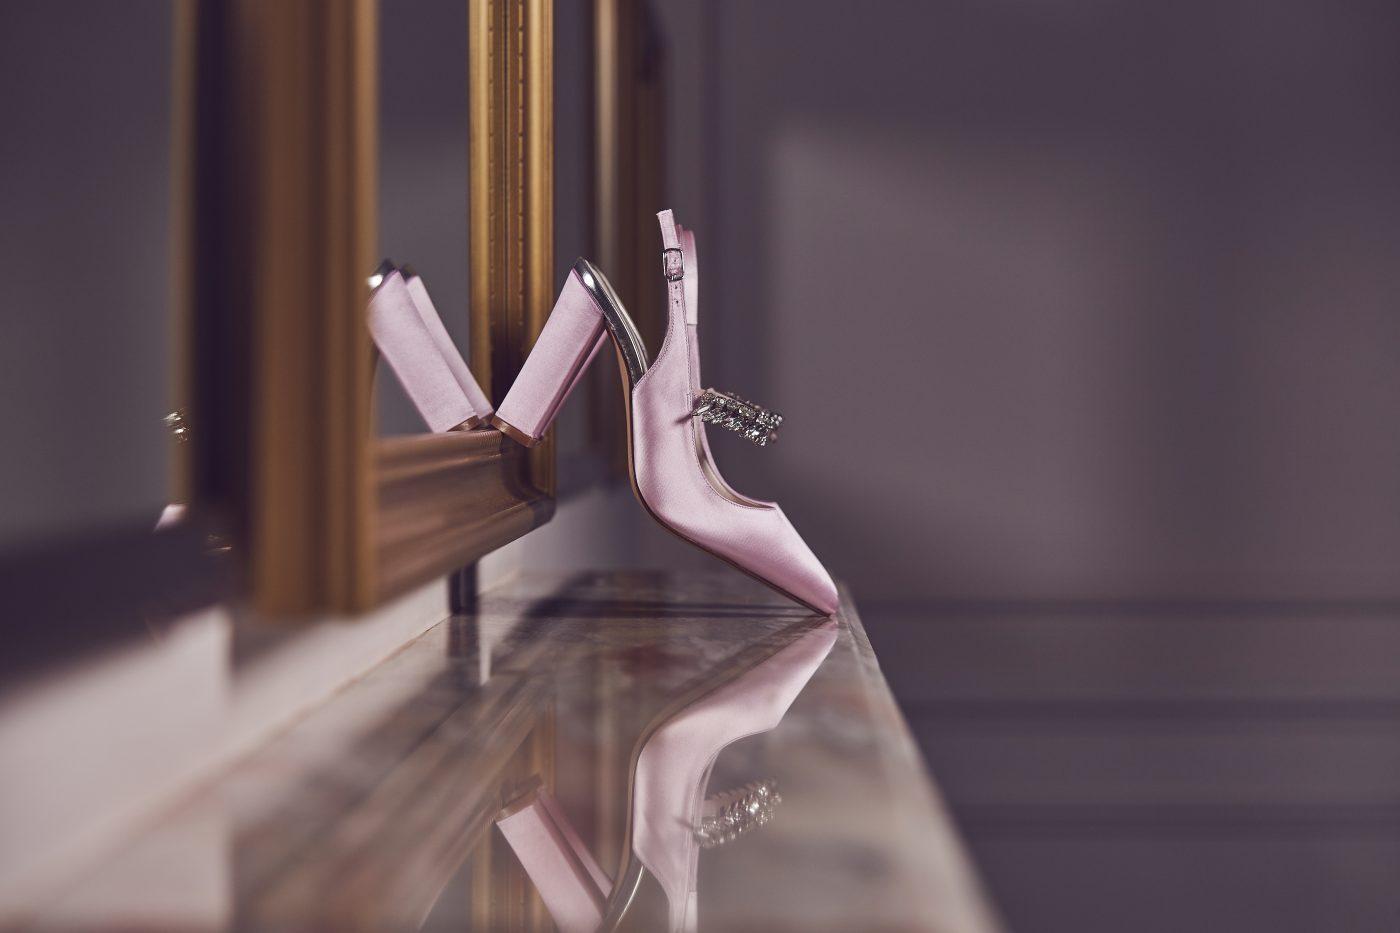 "<a href=""https://www.rainbowclub.co.uk/freya-slingback-wedding-shoes"" target=""_blank"" rel=""noopener noreferrer"">Freya Pink by Rainbow Club</a> £99"